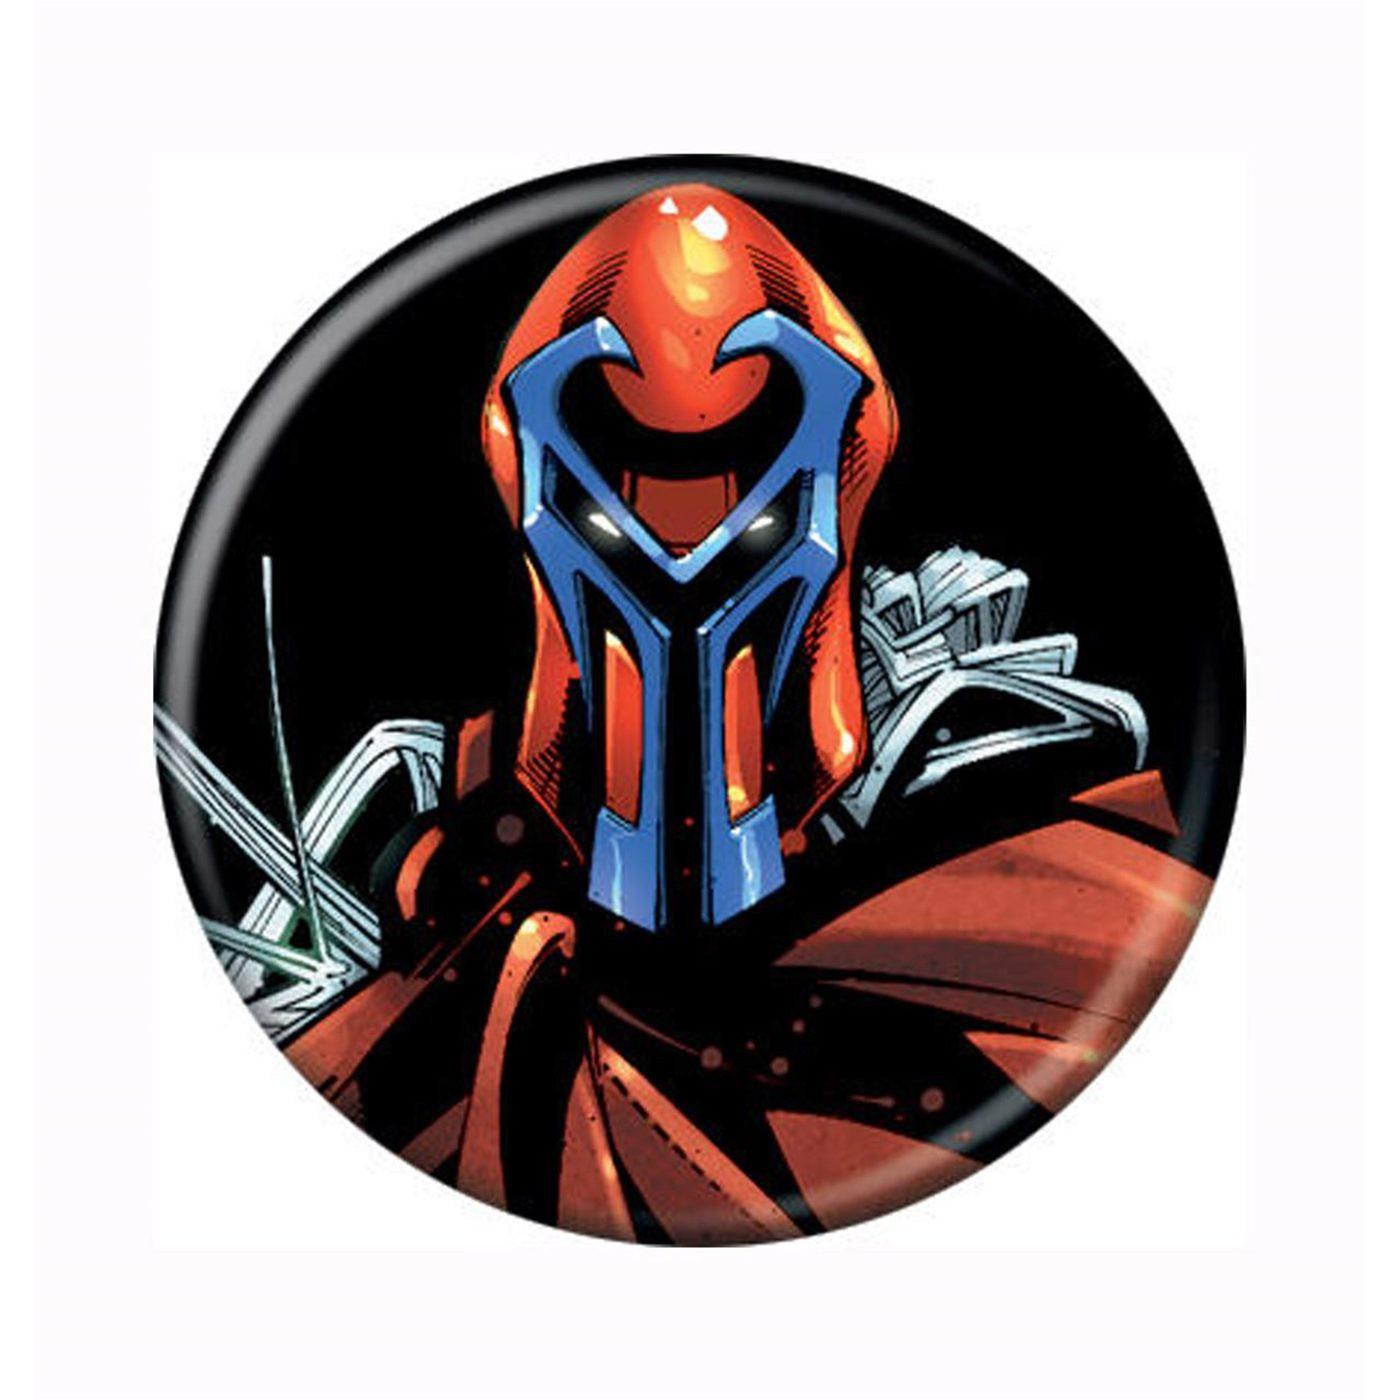 X-Men Magneto Button